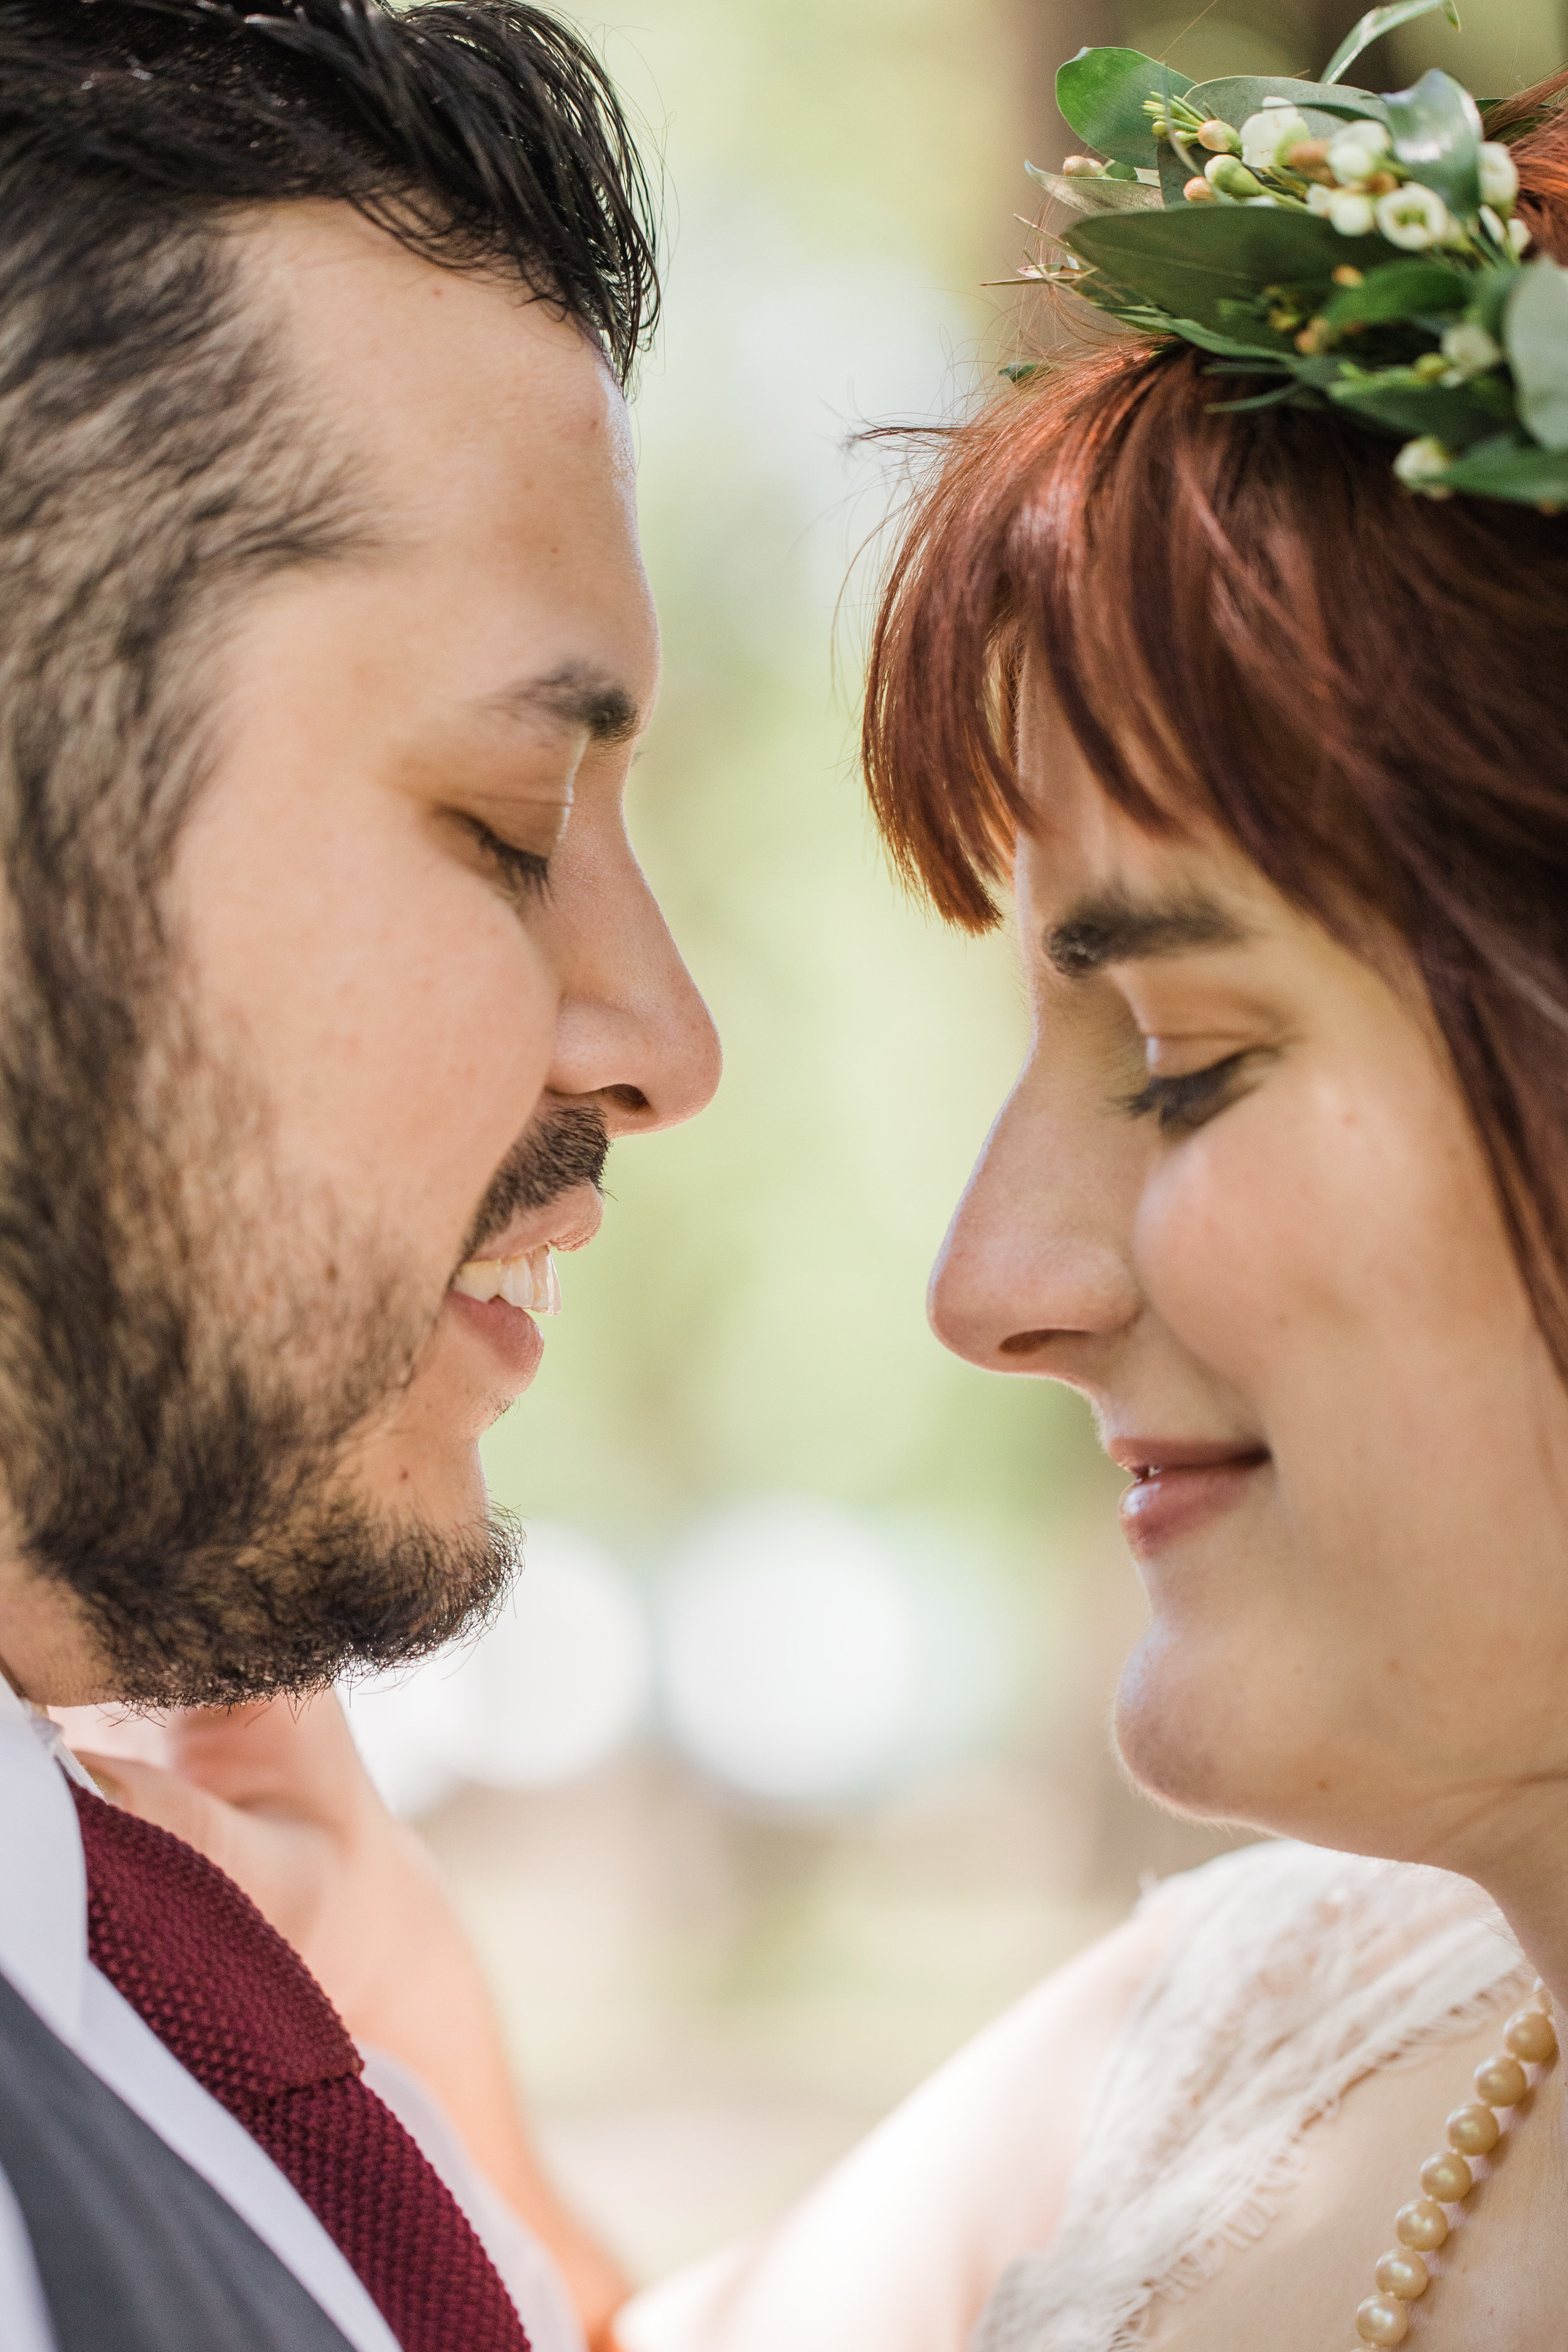 romantic iowa outdoors wedding first look photos lace dress close up photo